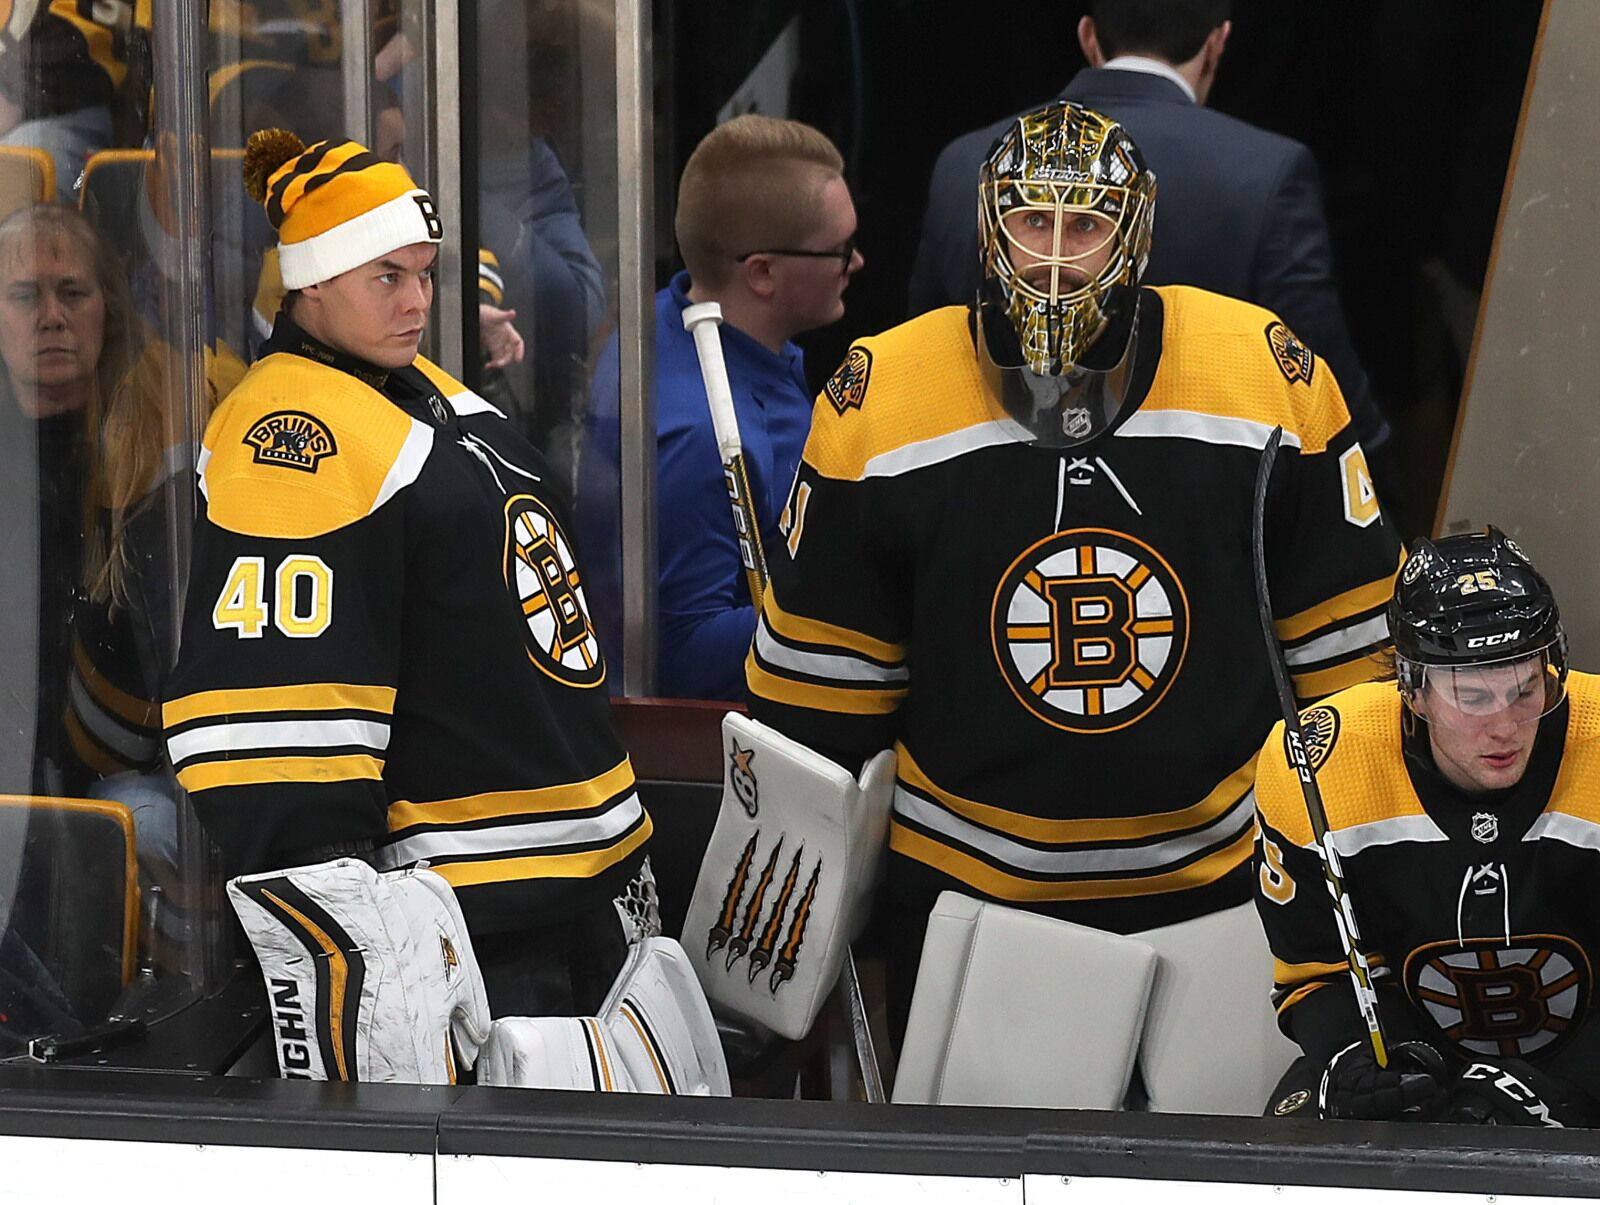 Boston Bruins: Too much invested in Tuukka Rask and Jaroslav Halak?